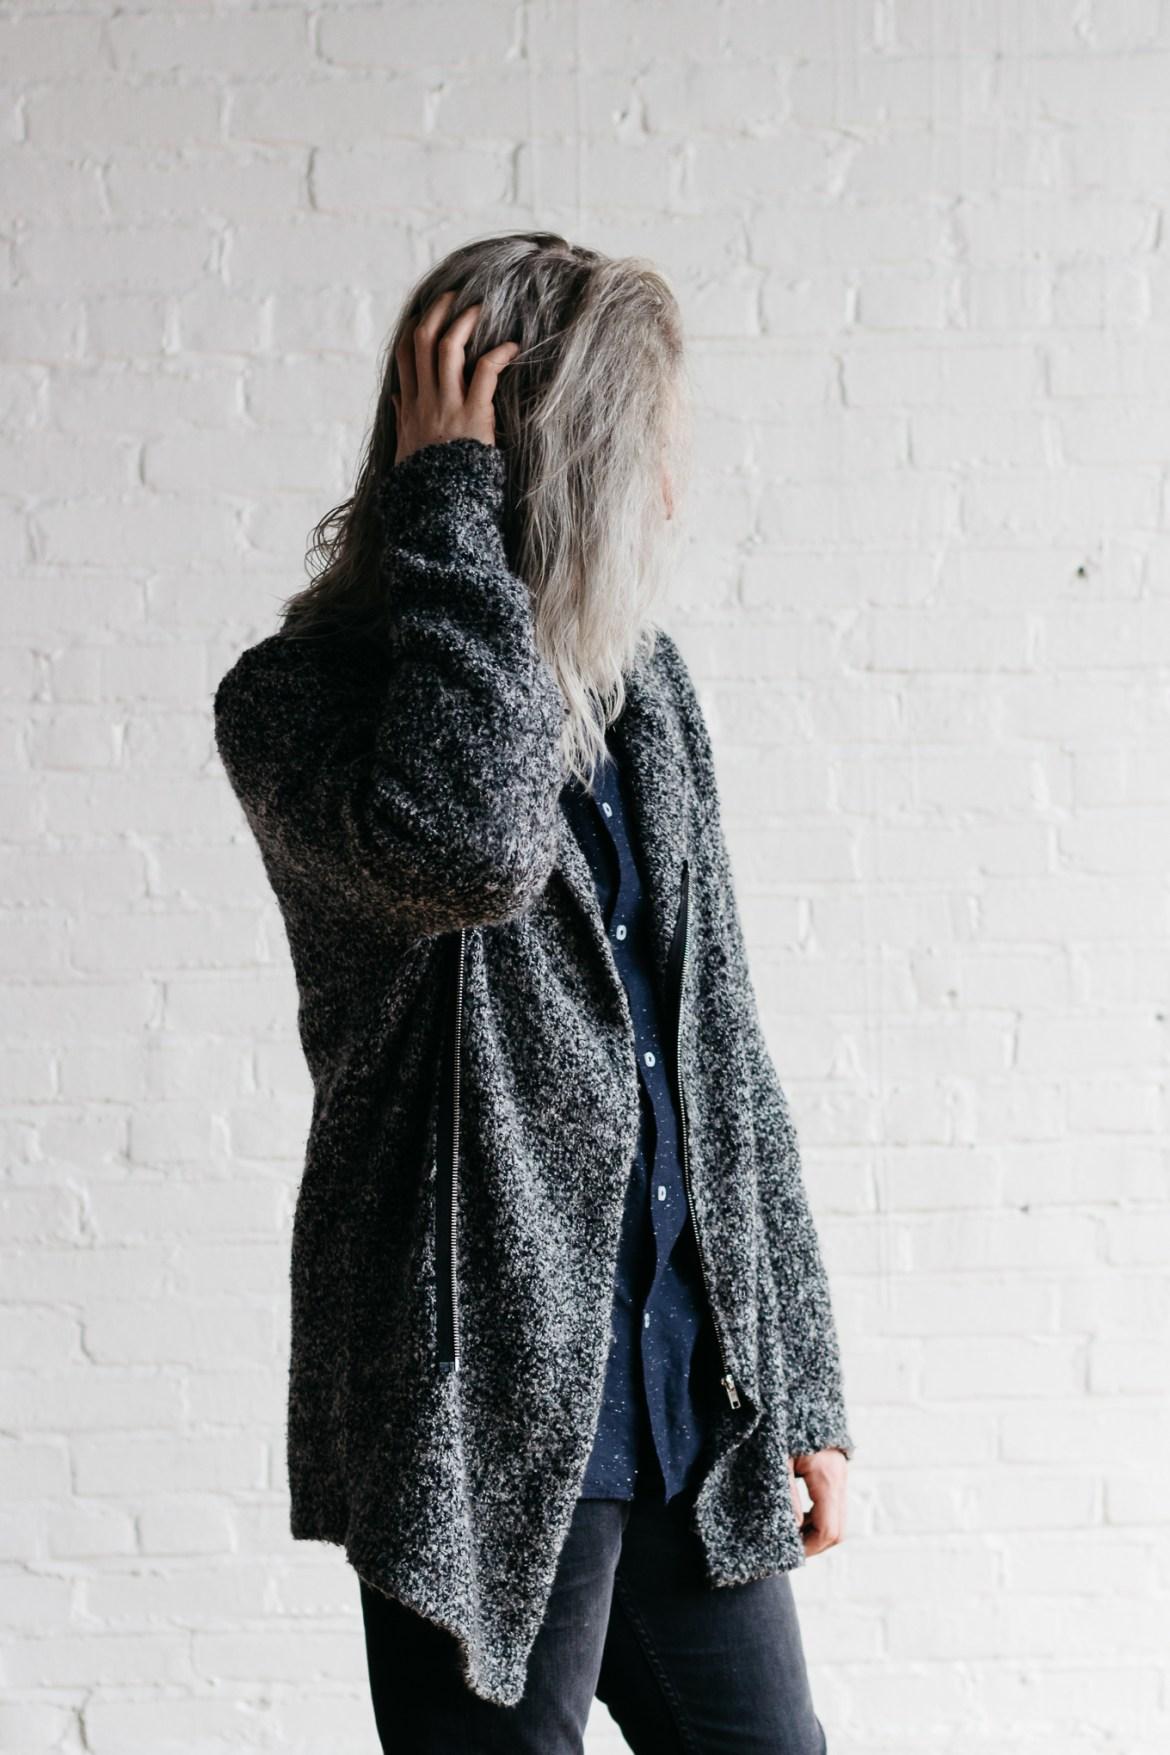 mens hm sweater, mens hm sweater jackets, mens gray hm denim, men with long hair